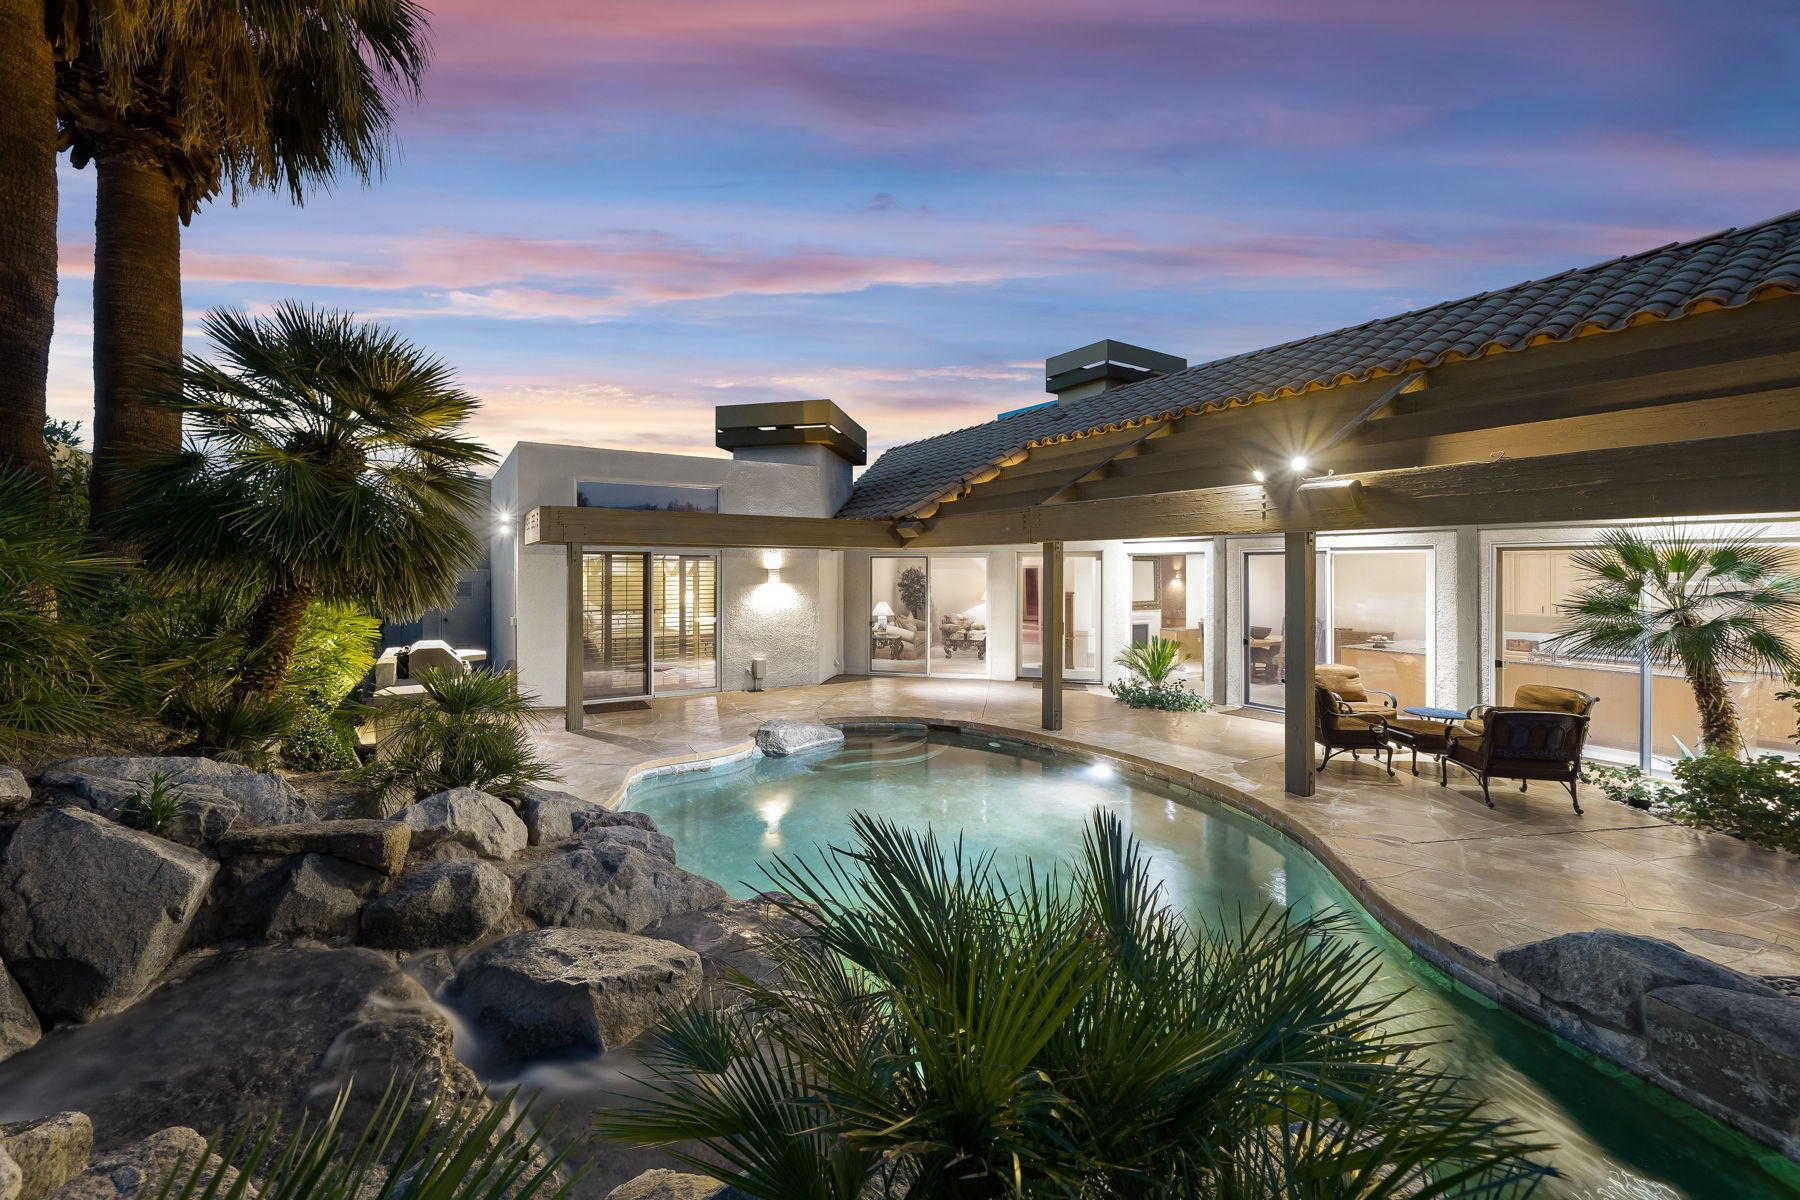 $950,000 - 2Br/3Ba -  for Sale in The Quarry, La Quinta